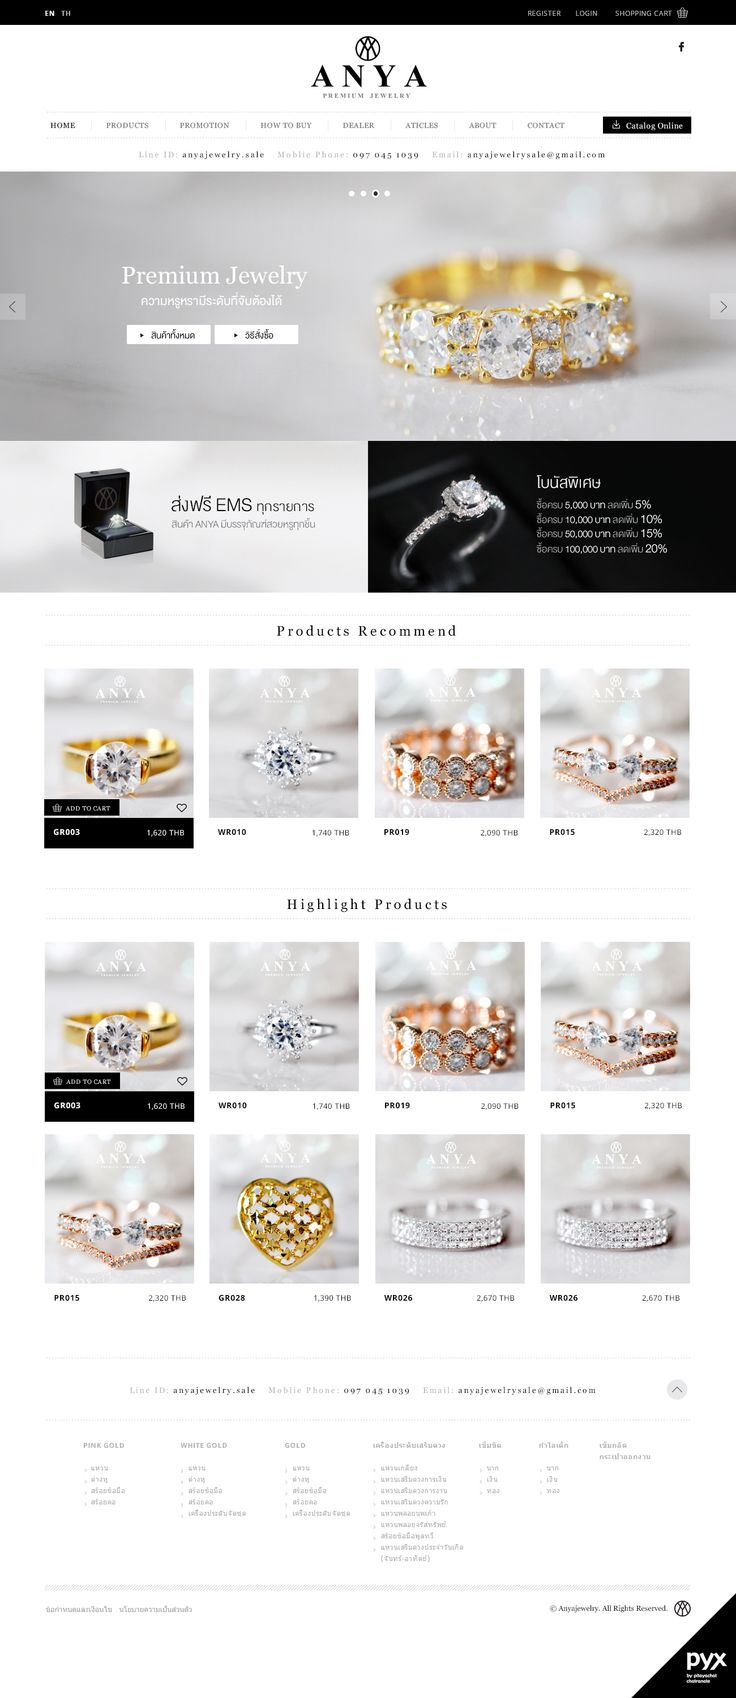 ANYA Jewelry Website | created: 7 Jan 2015 | designed by PyX